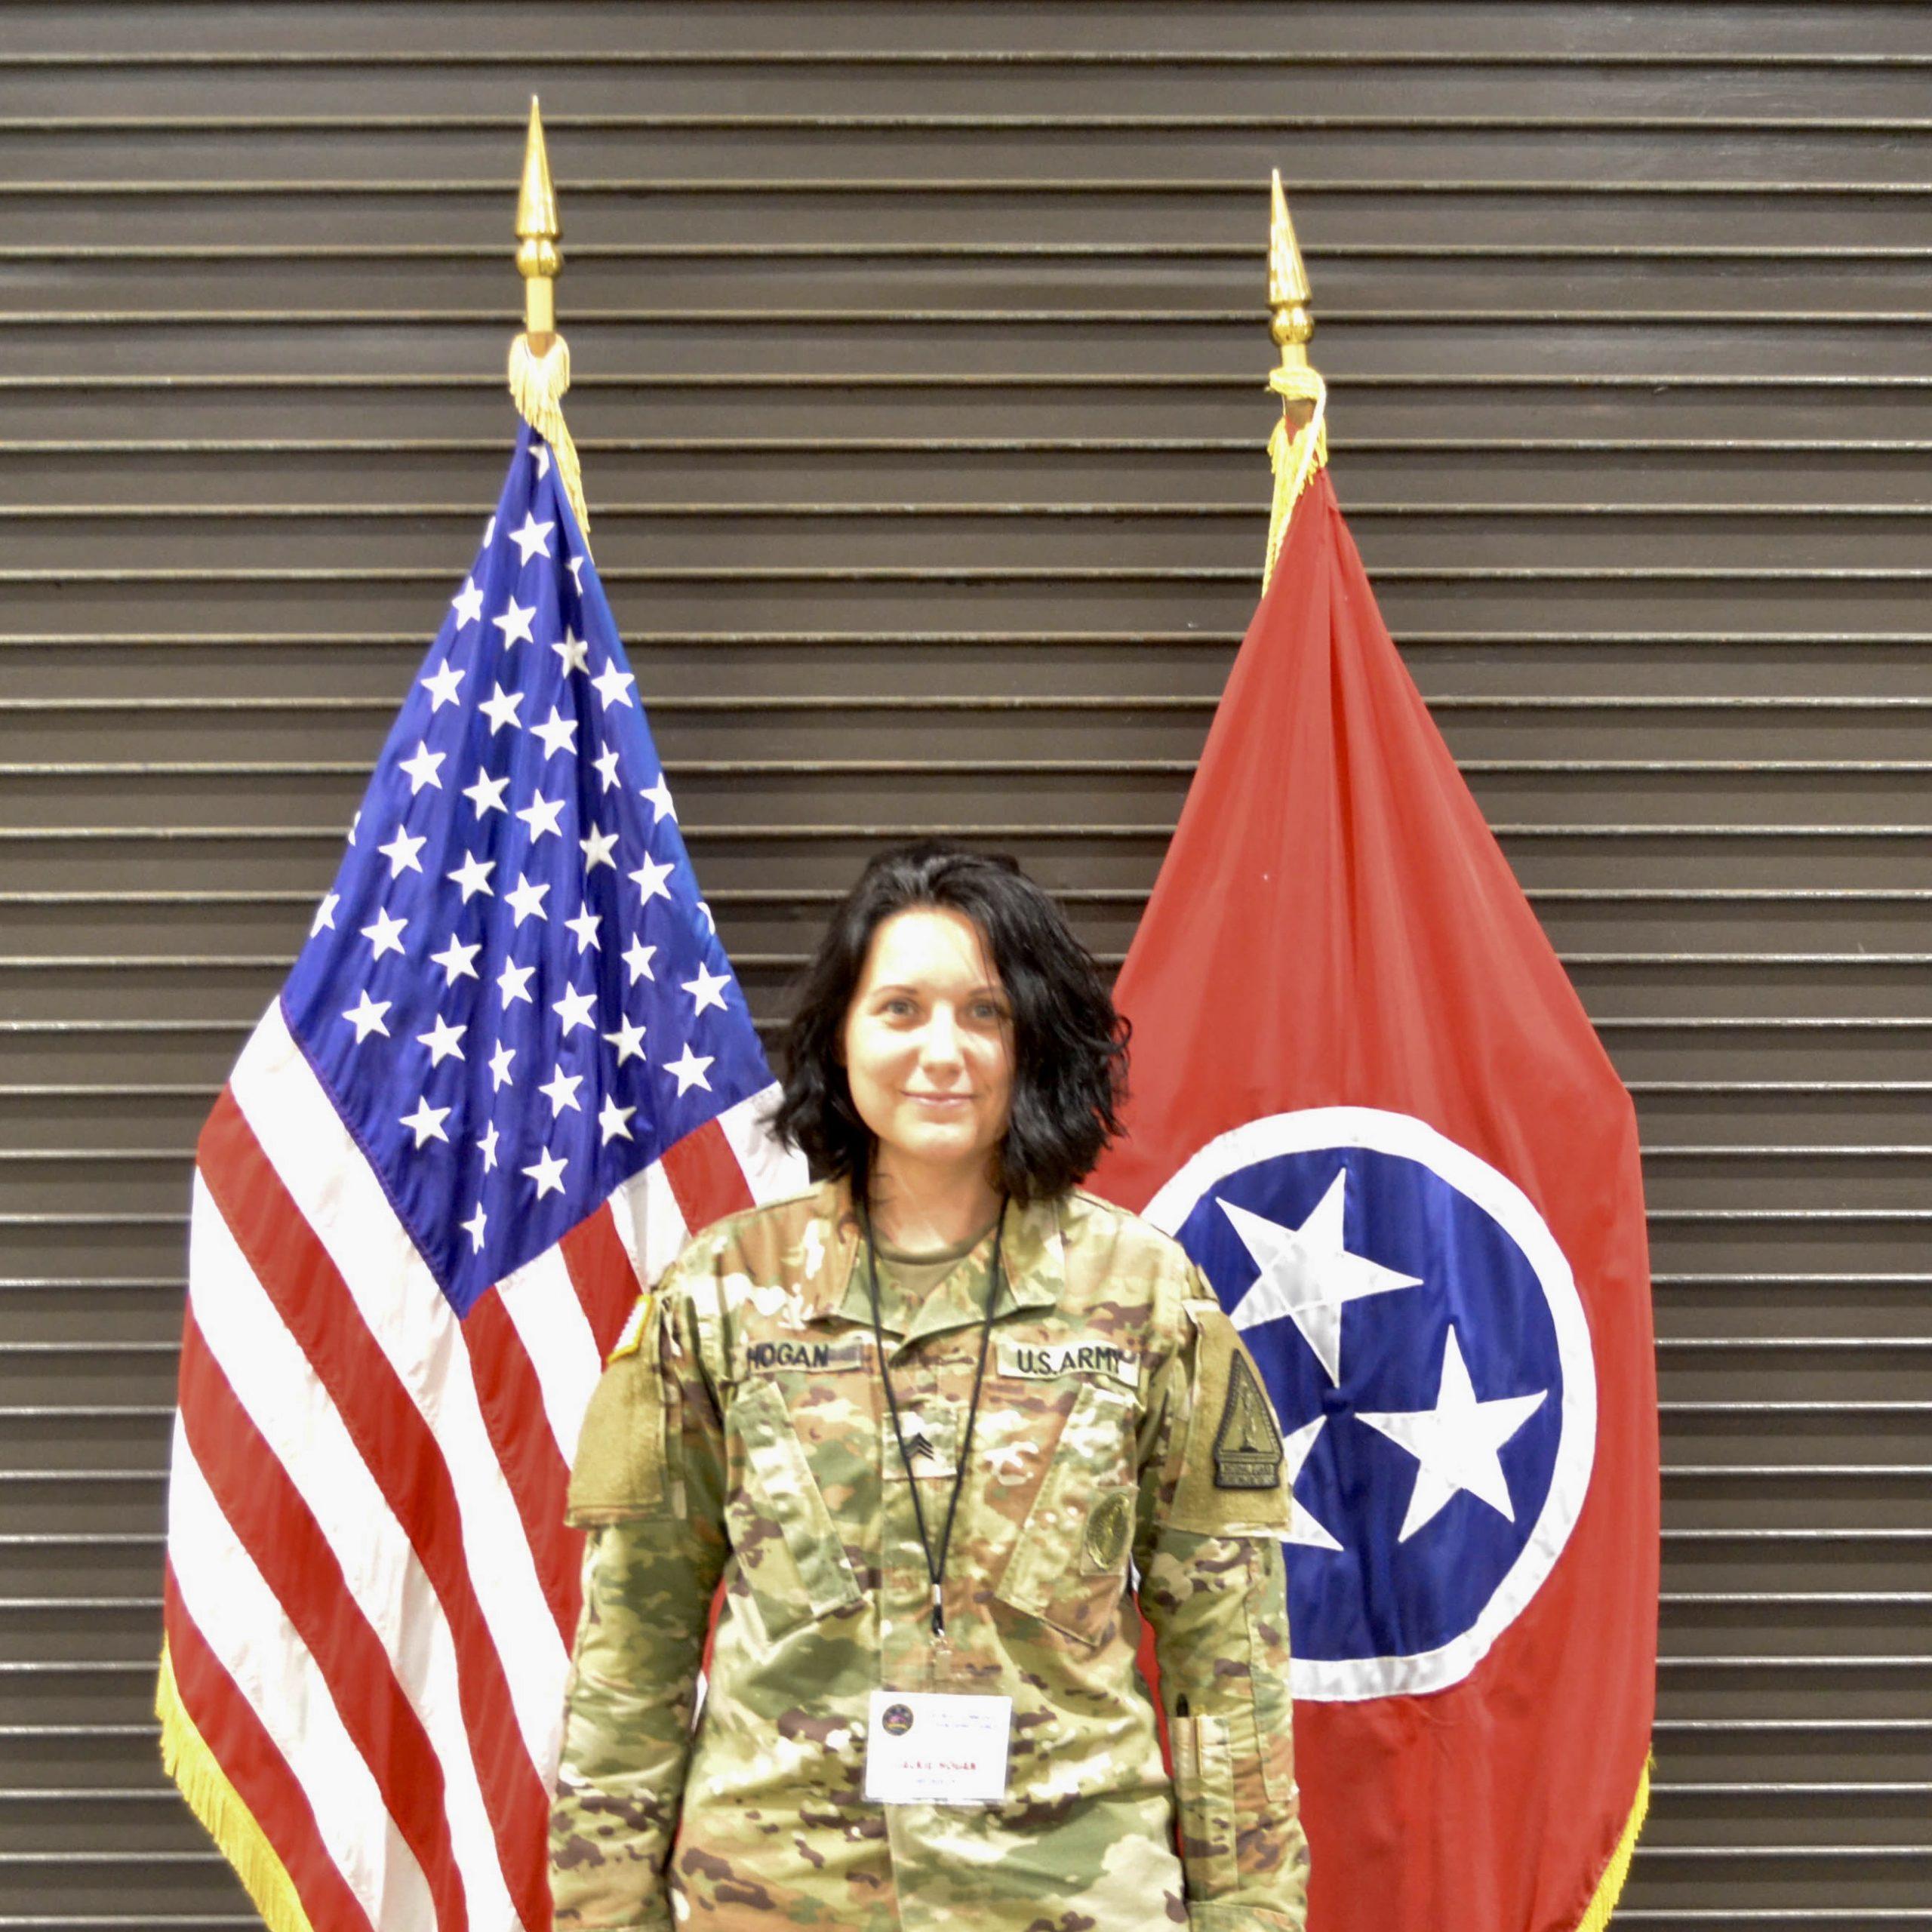 Sgt. Jacqualin Hogan